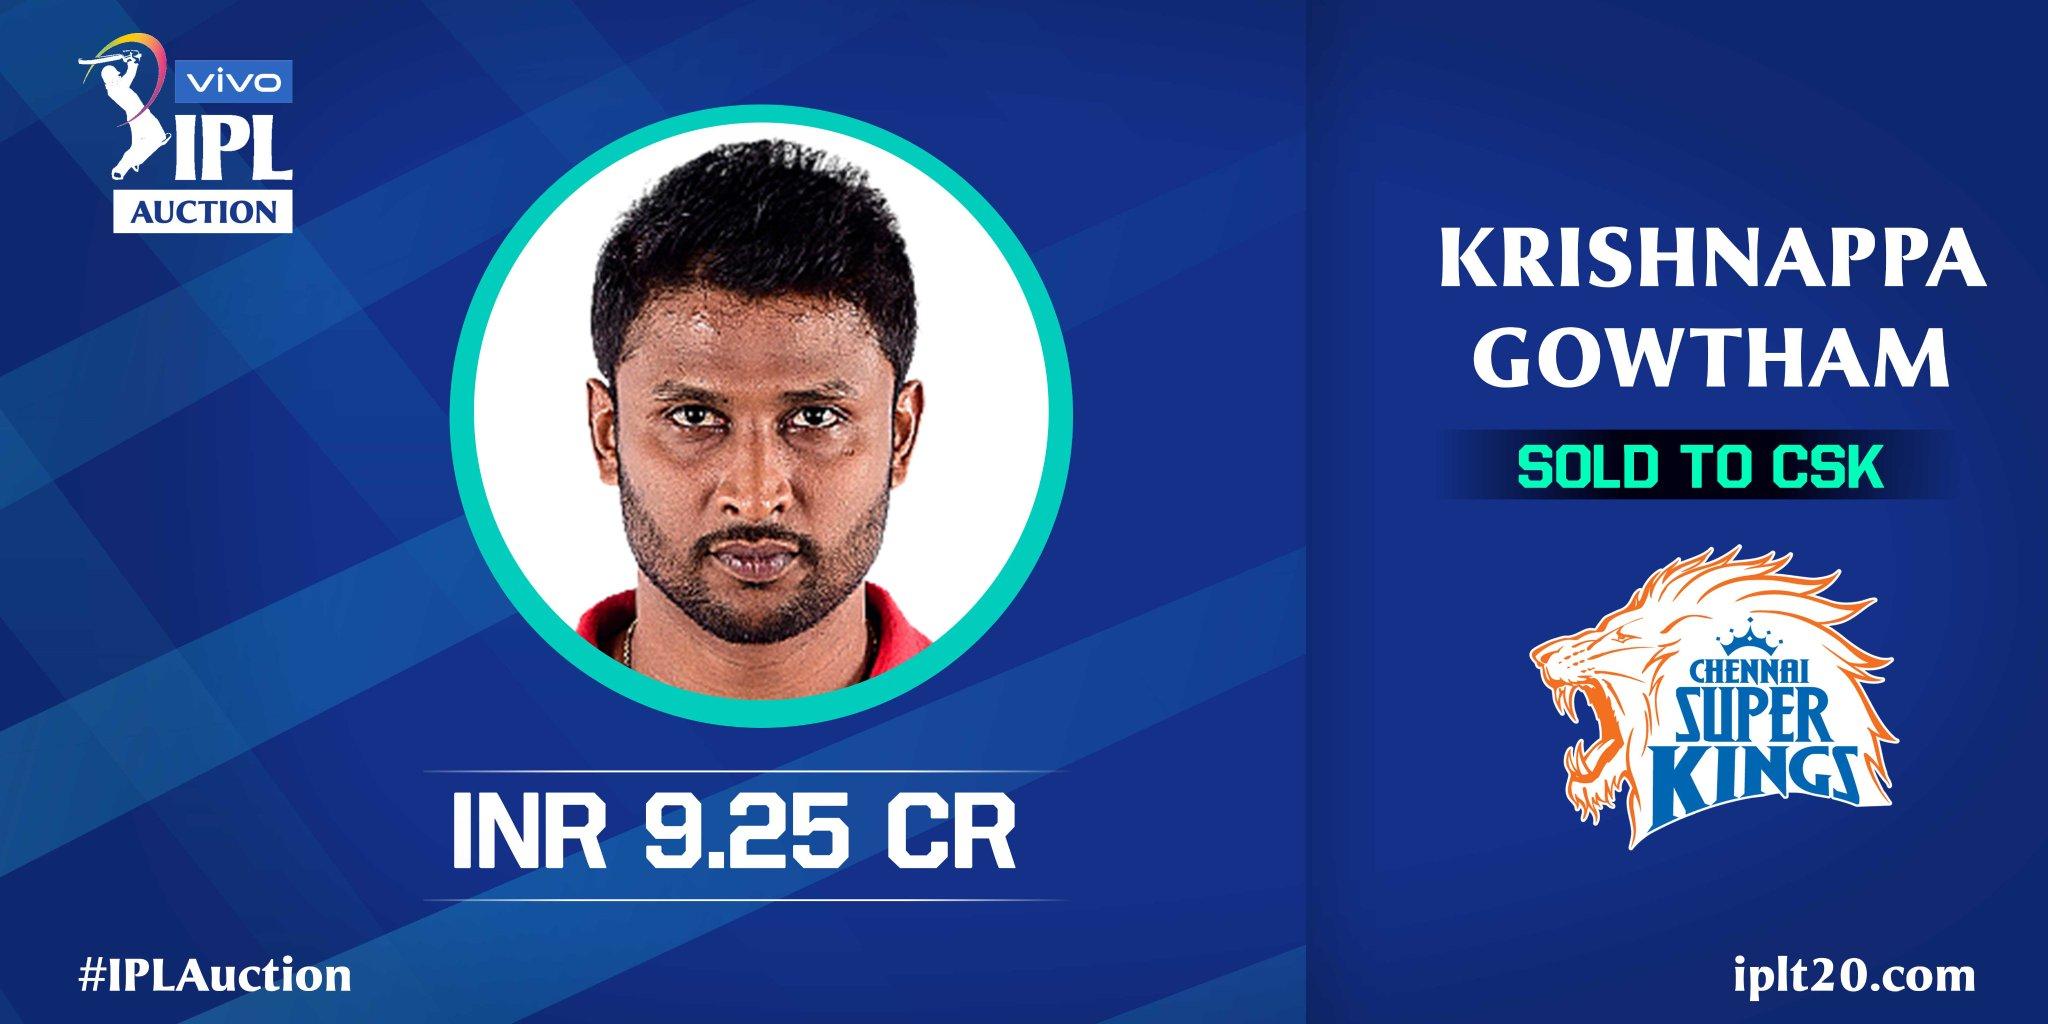 Krishnappa Gawtham IPL 2021 Auction